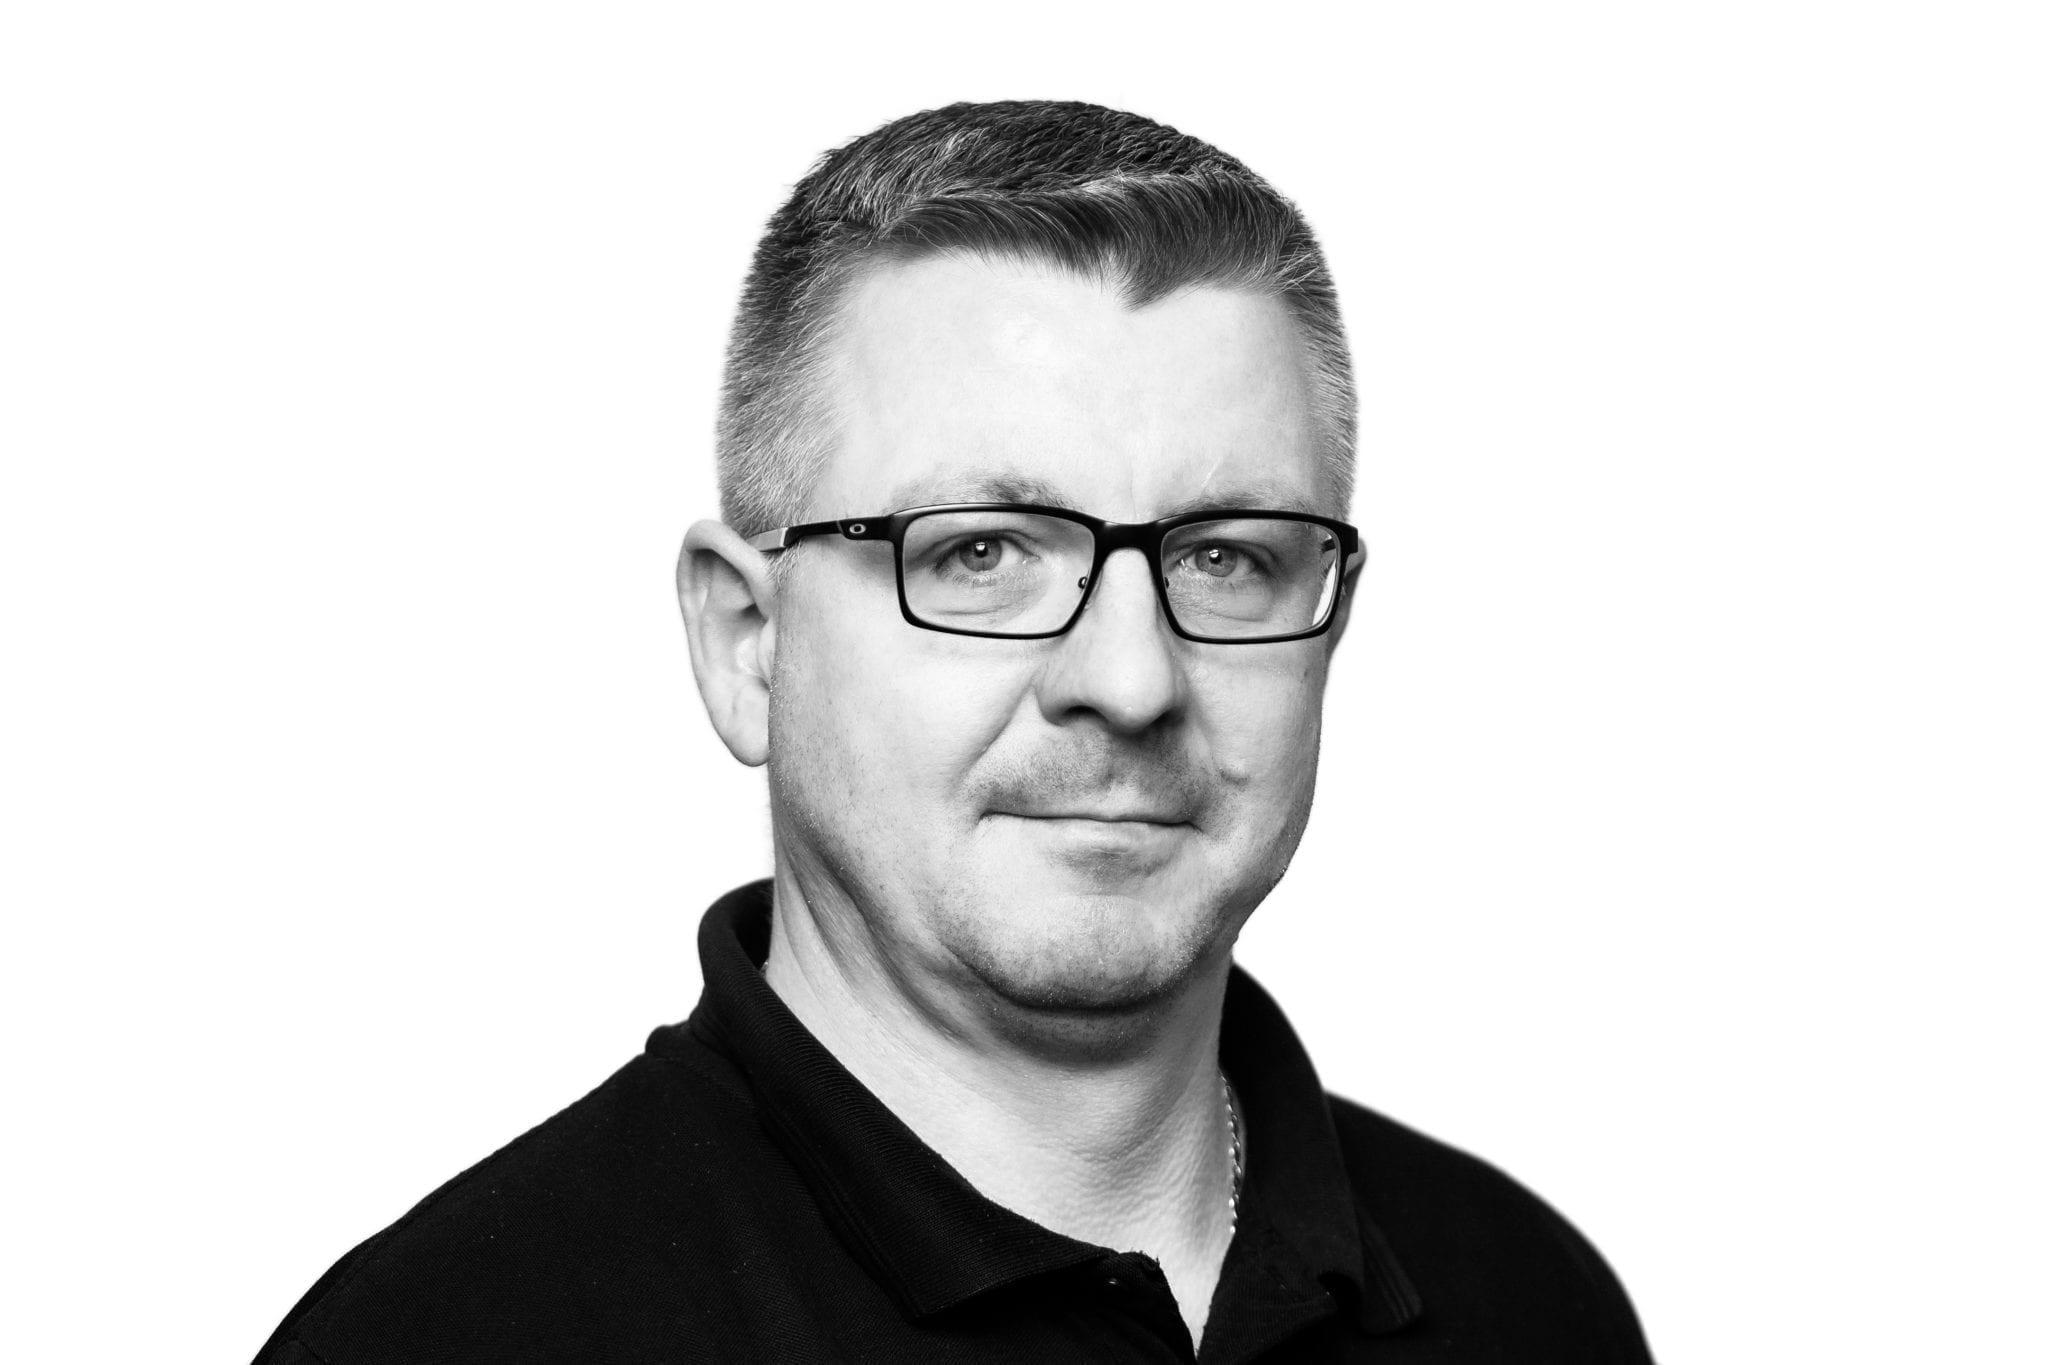 Tomasz Jagusiak